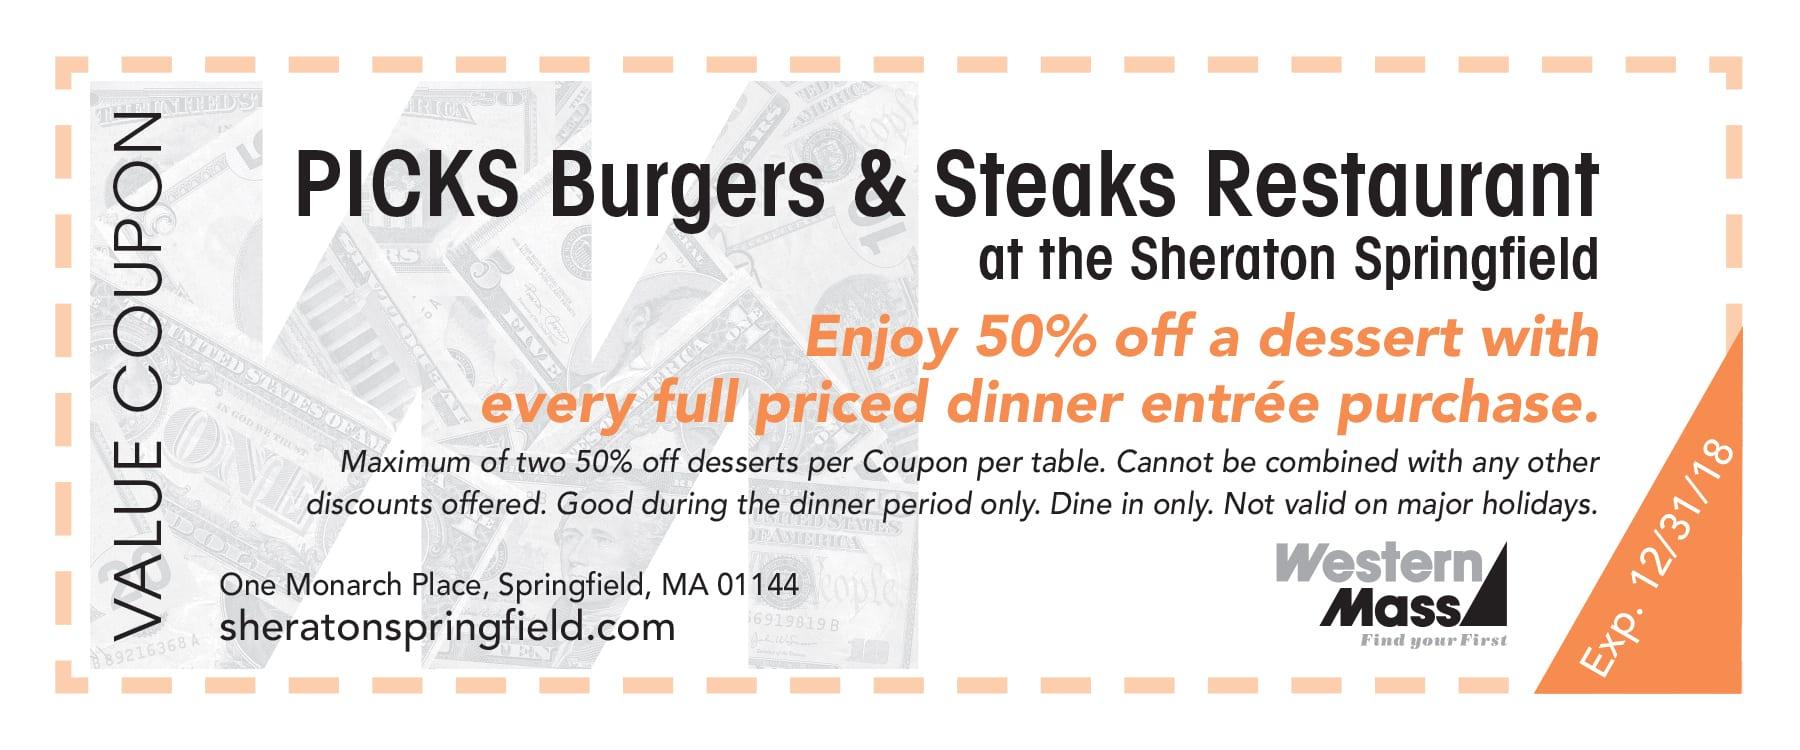 PICKS Burgers & Steaks Restaurant